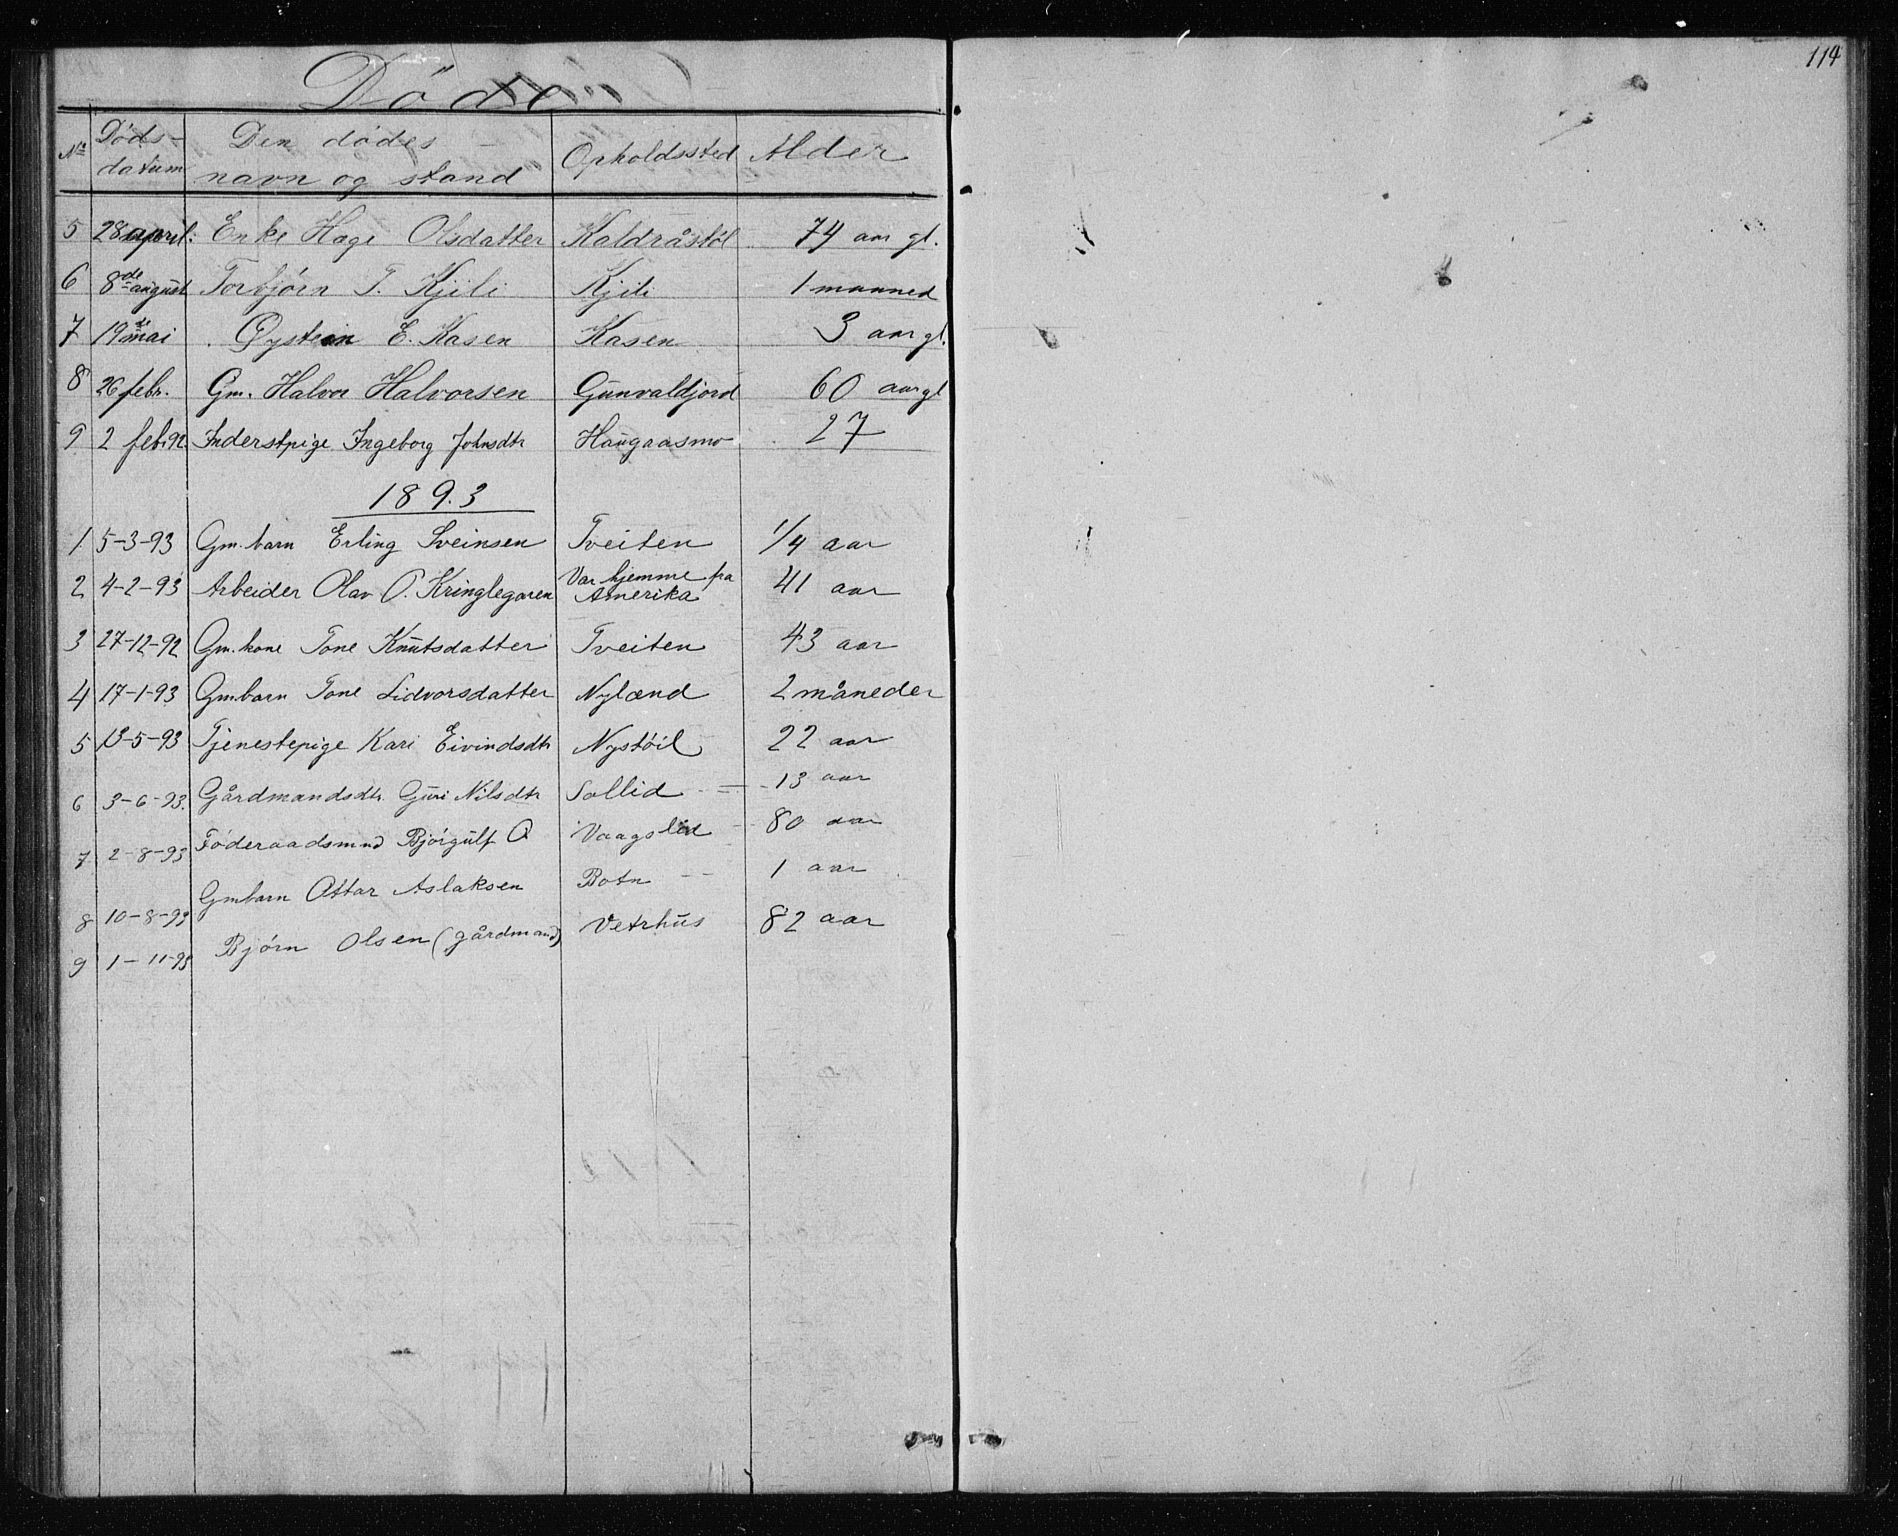 SAKO, Vinje kirkebøker, G/Gc/L0001: Klokkerbok nr. III 1, 1850-1893, s. 114